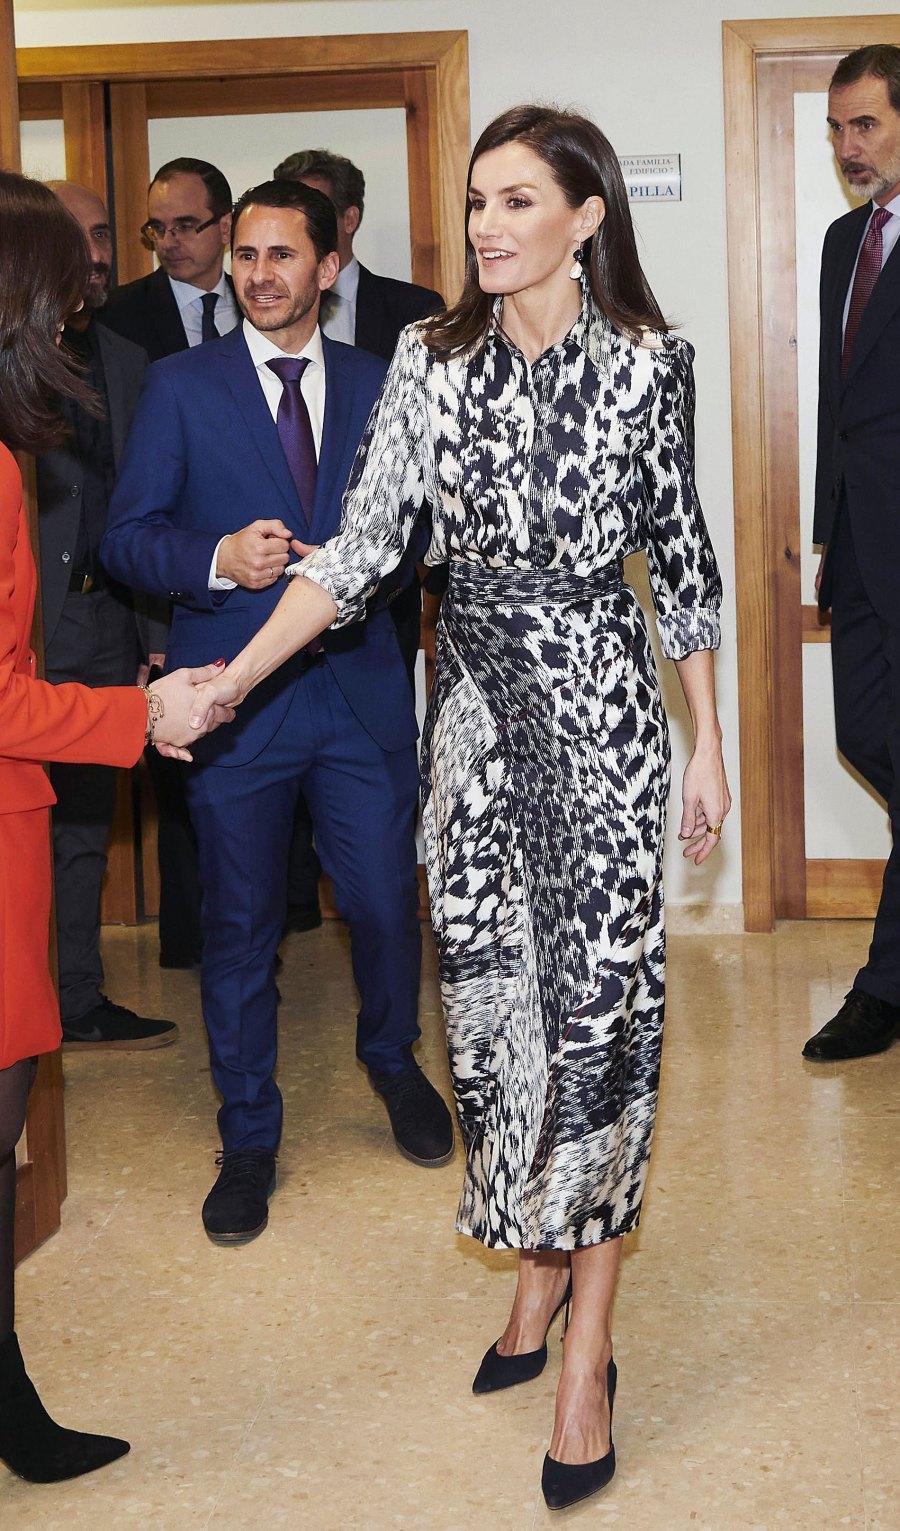 Queen Letizia Animal Print Dress February 6, 2020